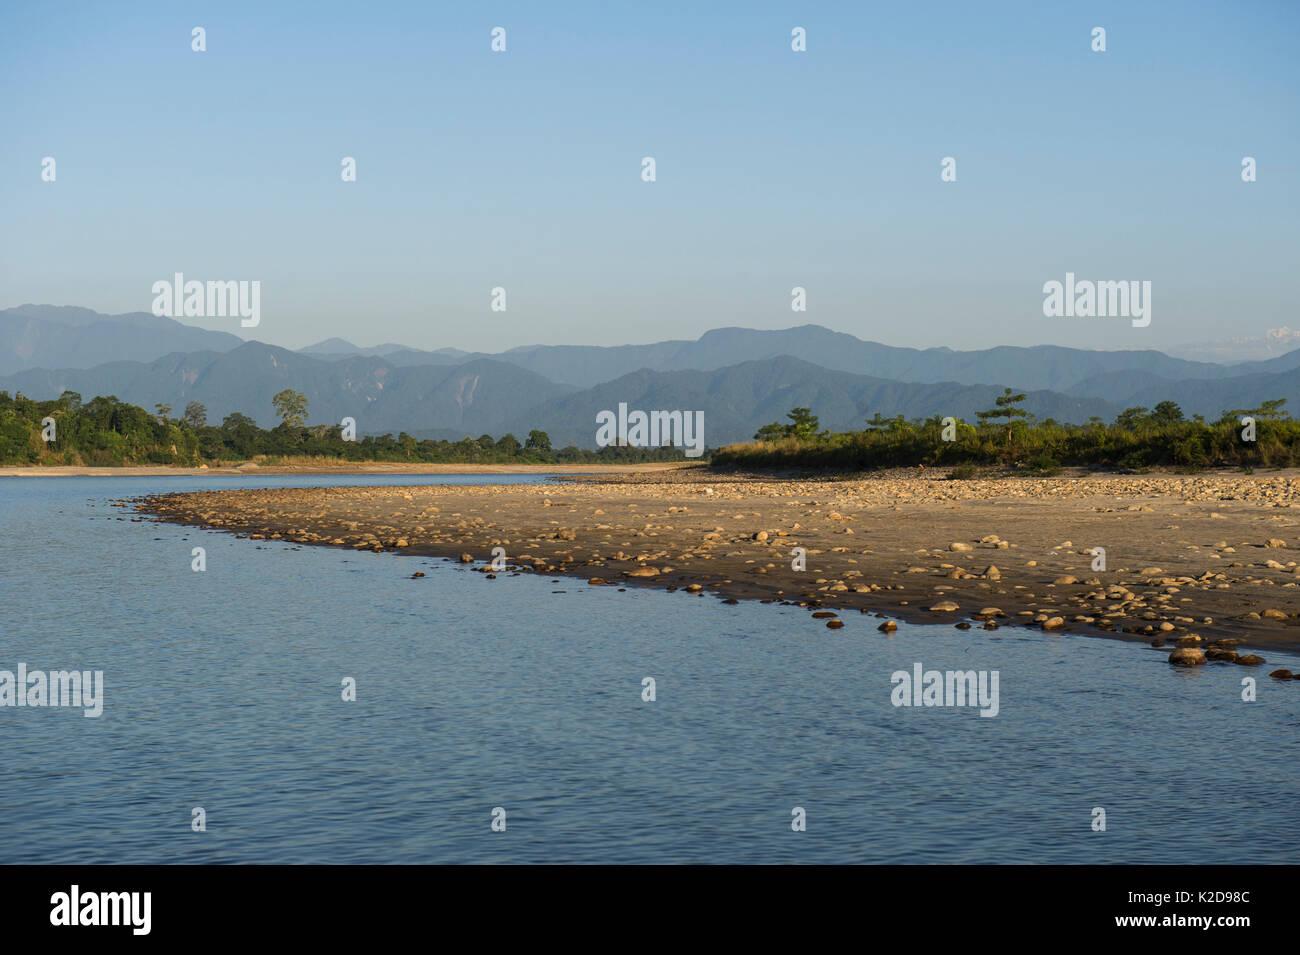 Landscape of the Jai Bhoralli River, Nameri Wildlife Reserve, Assam, North East India November 2014. - Stock Image